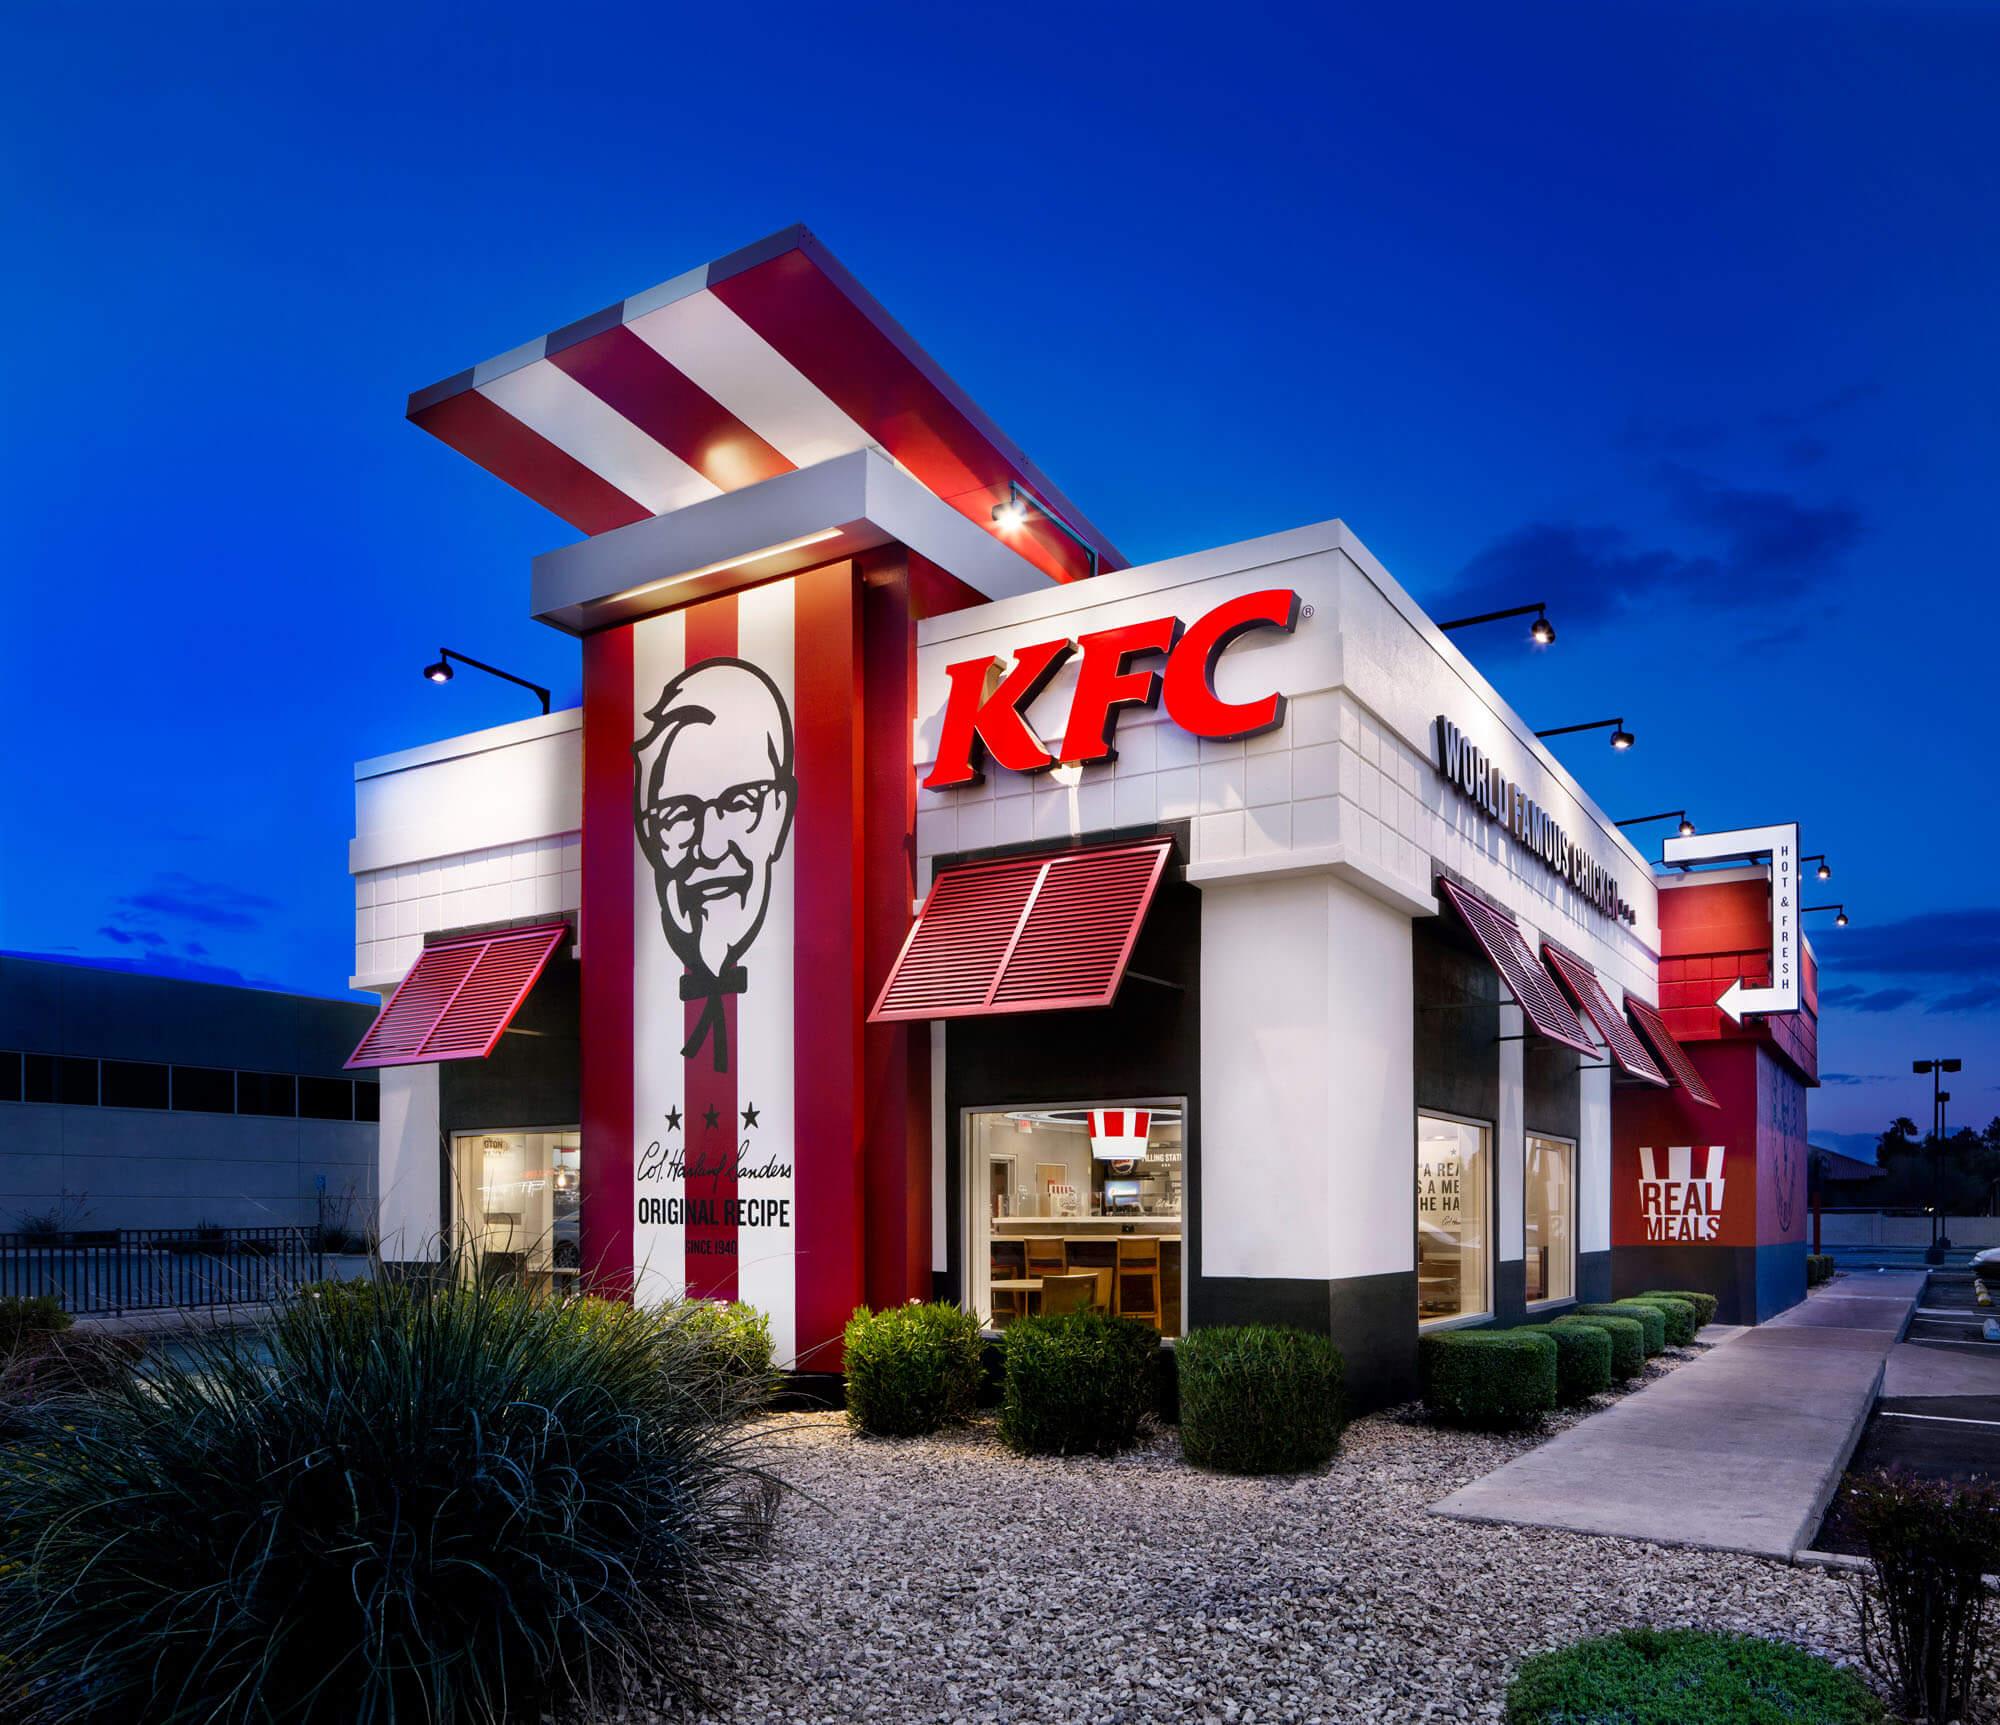 South Africa KFC Survey